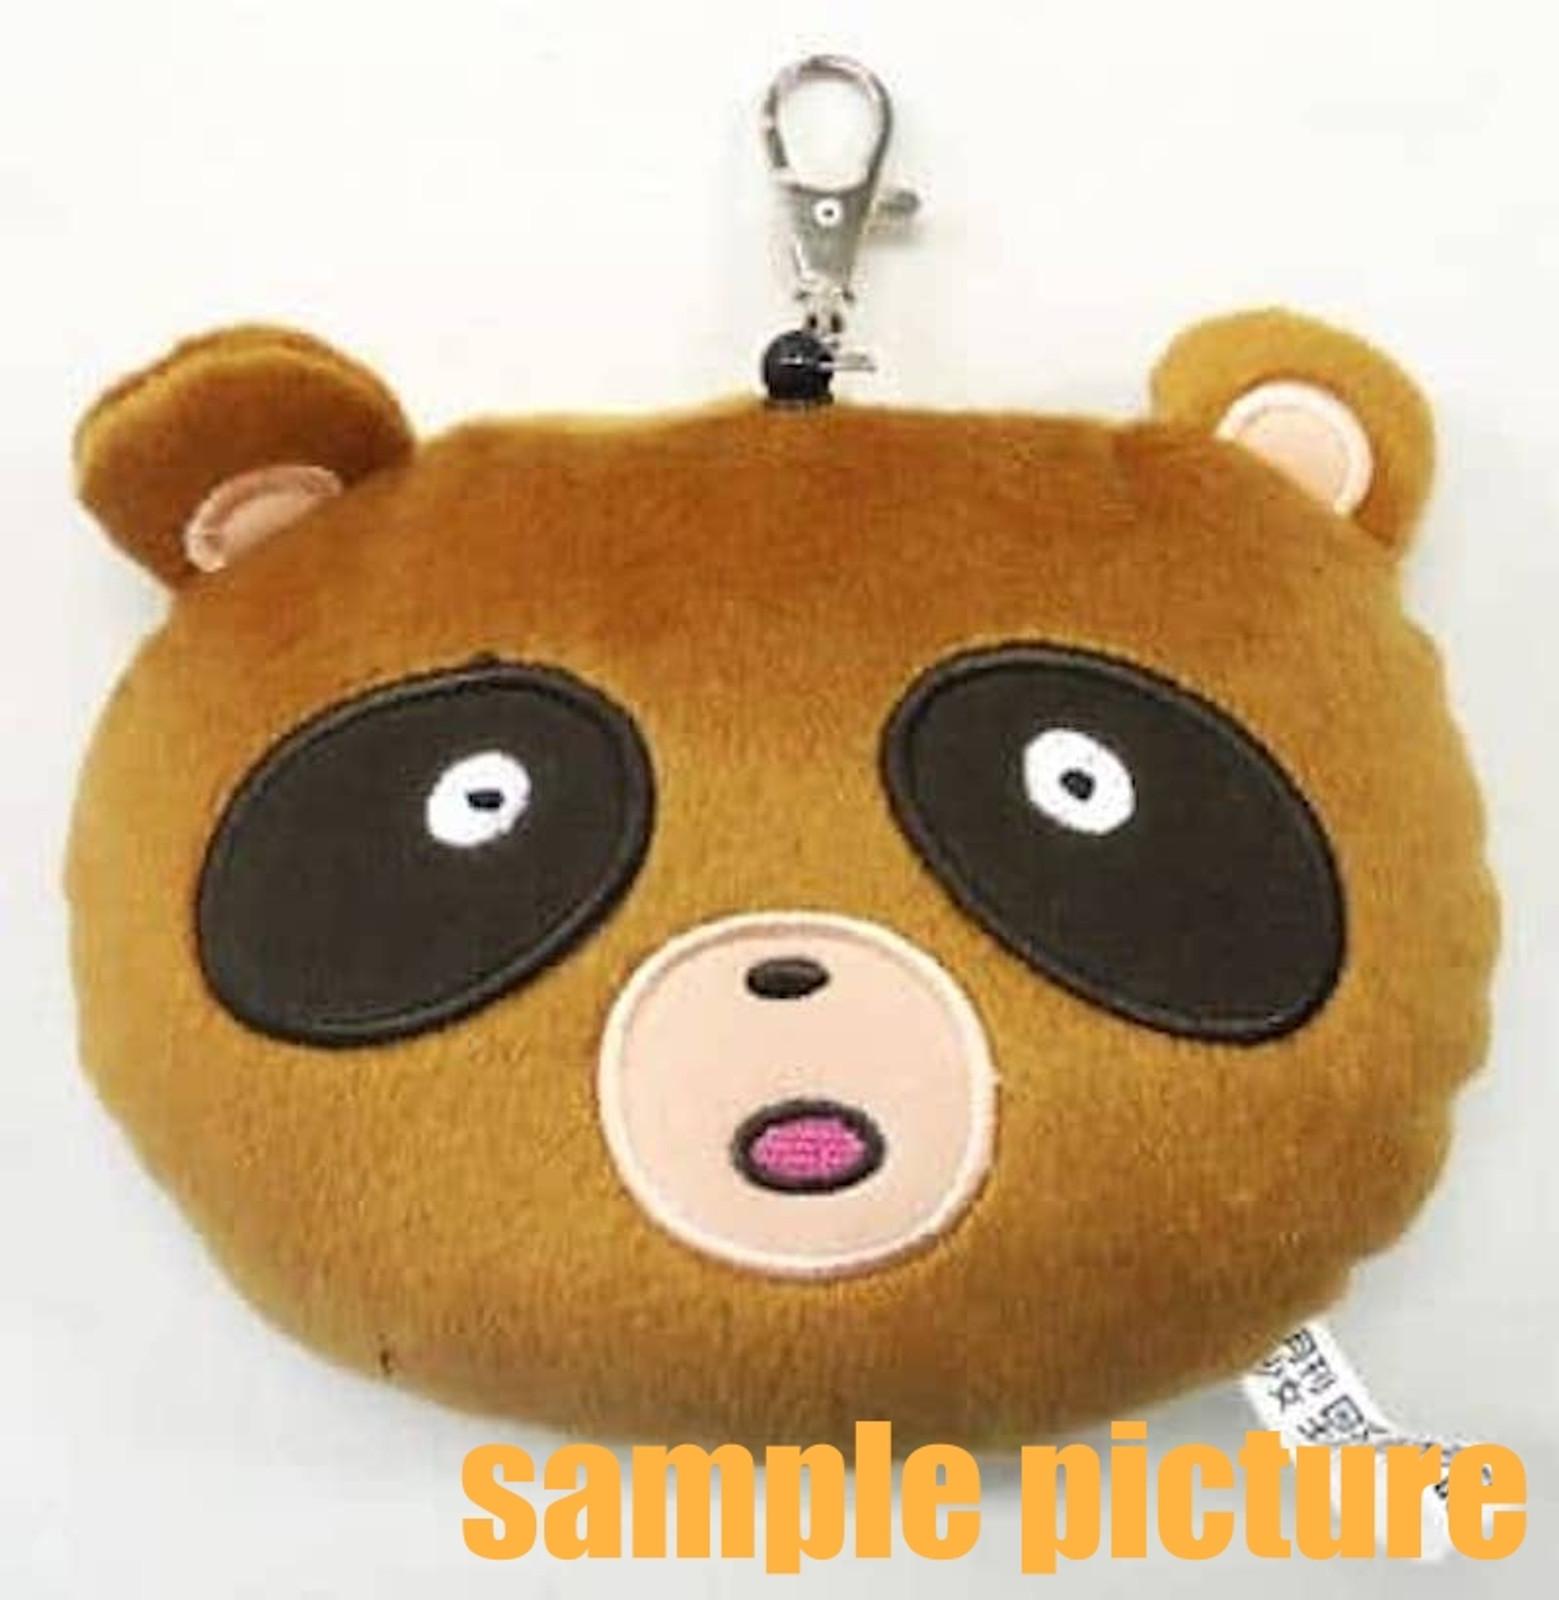 Monthly Girls' Nozaki-kun Tanuki Raccoon Dog Plush Doll Type Pass-card Case